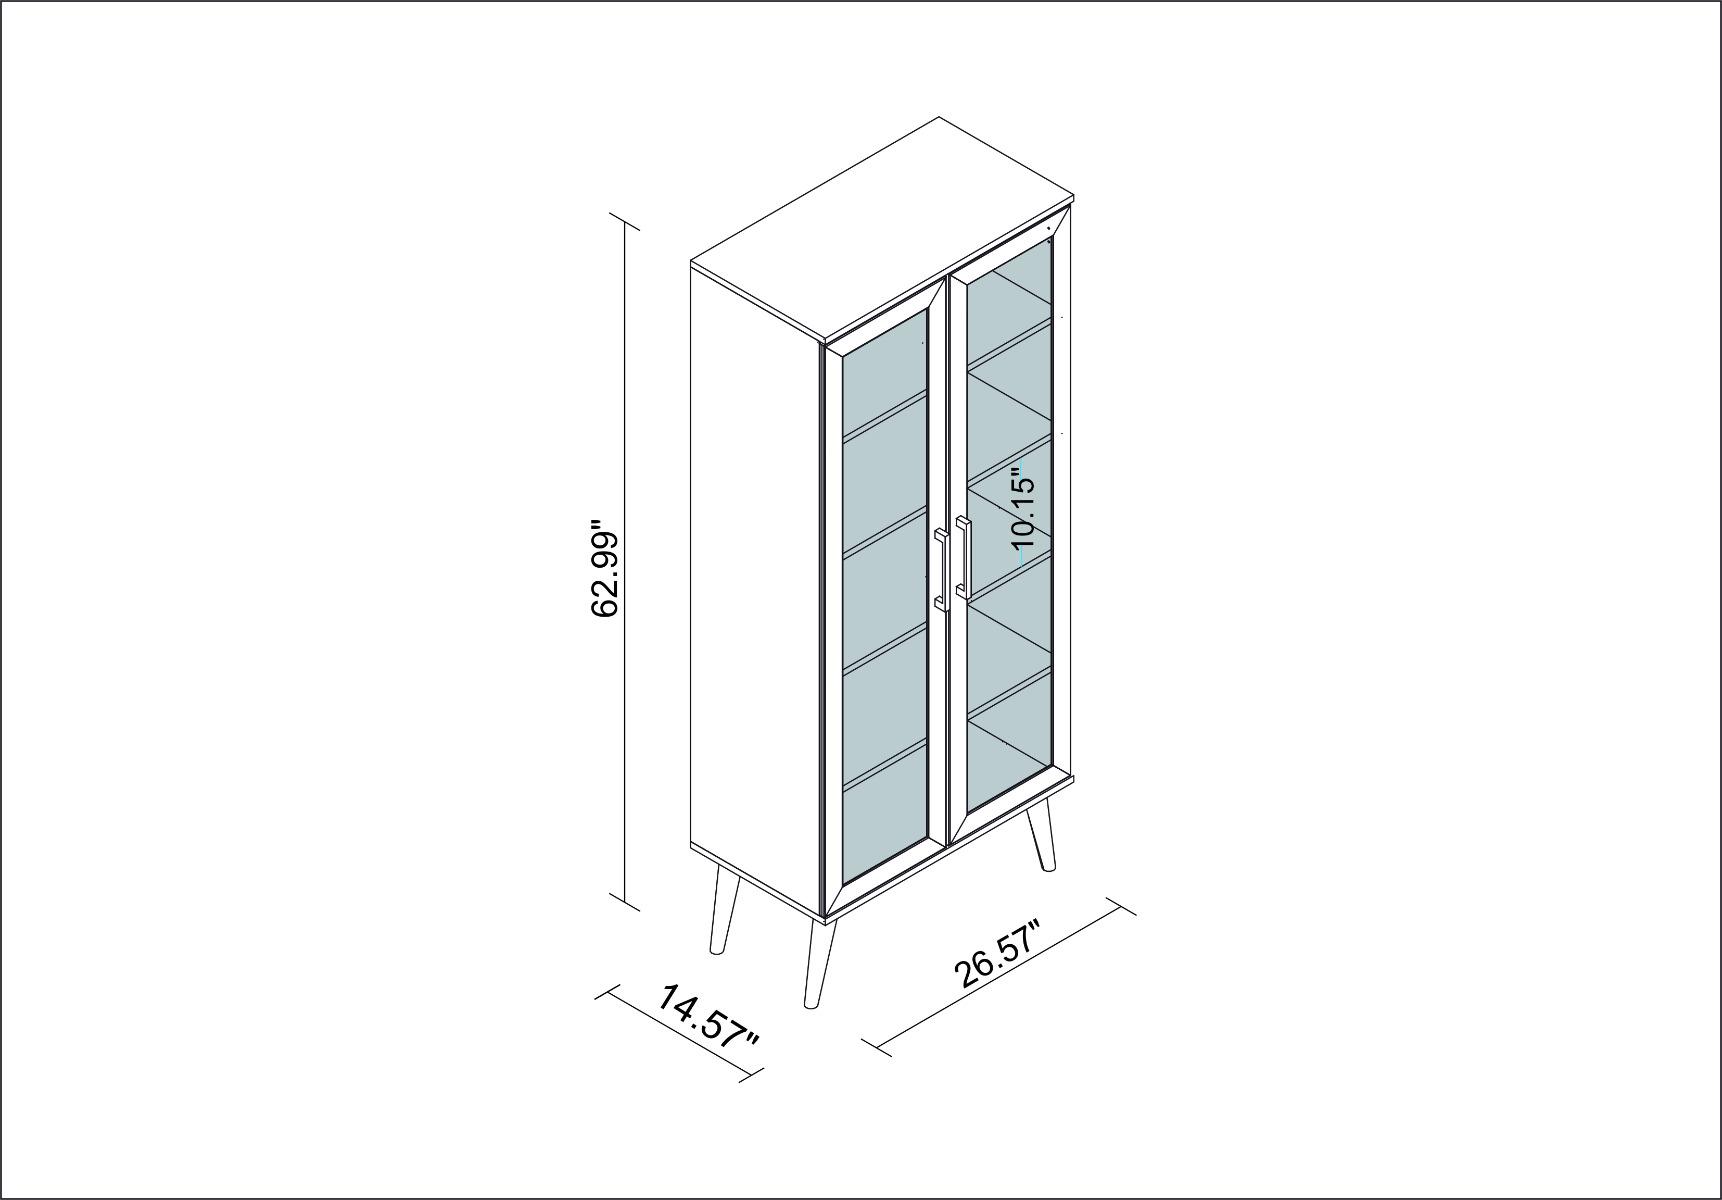 Serra Bookcase 2.0